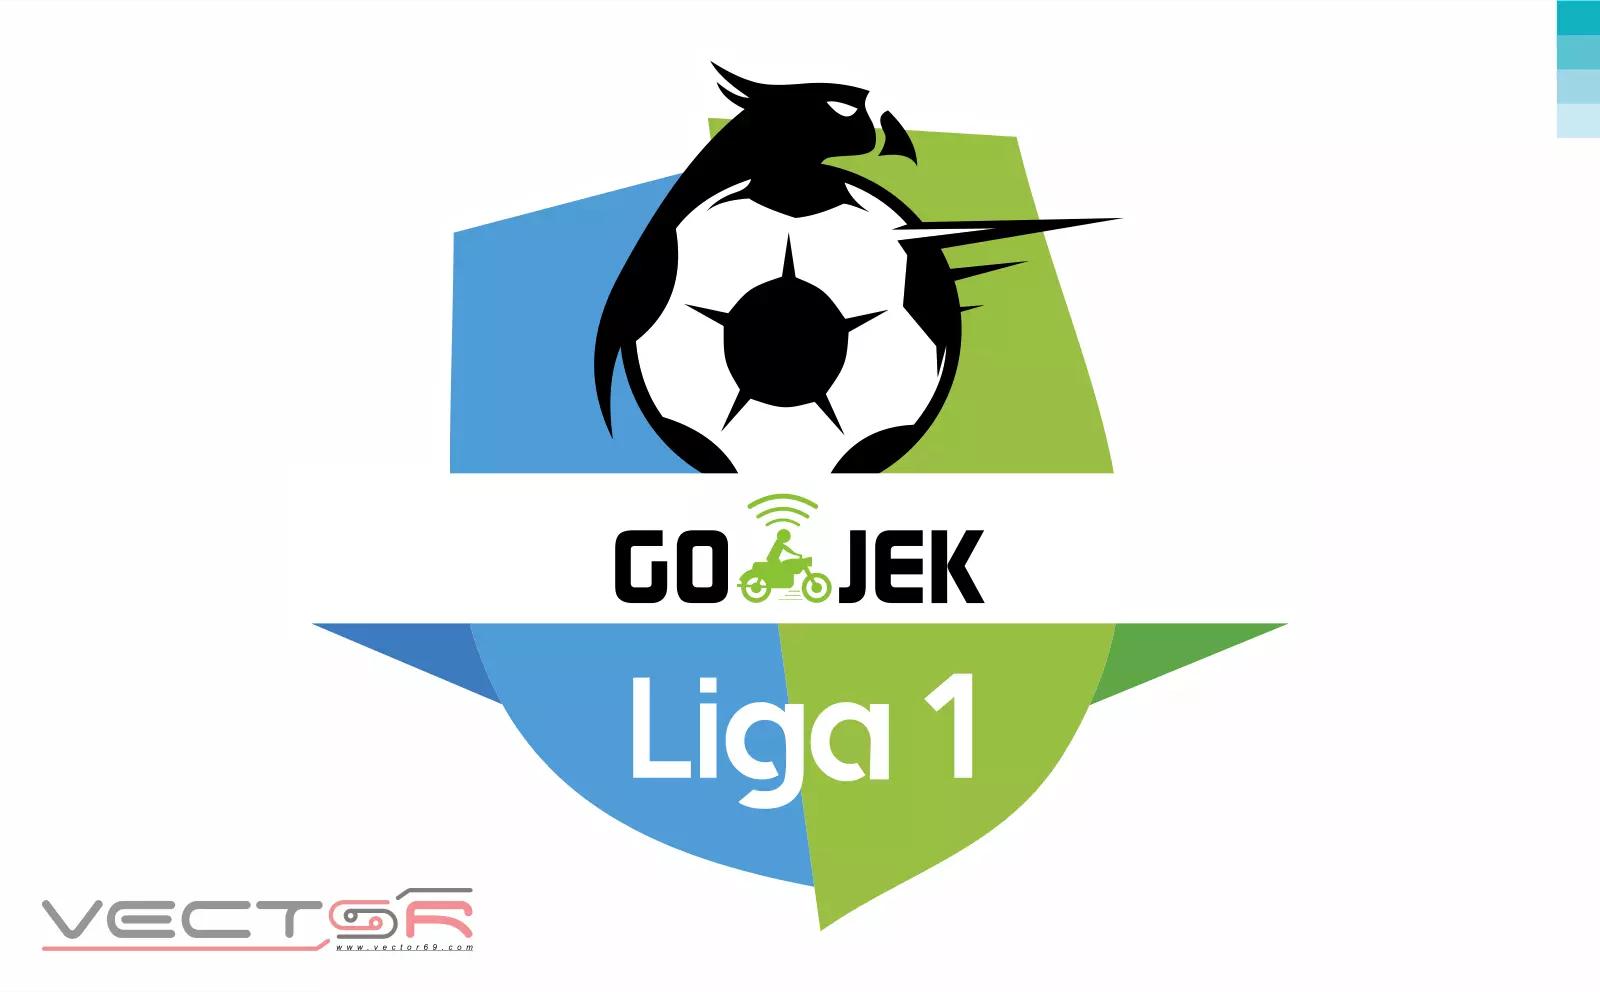 Gojek Liga 1 Indonesia Logo - Download Vector File SVG (Scalable Vector Graphics)